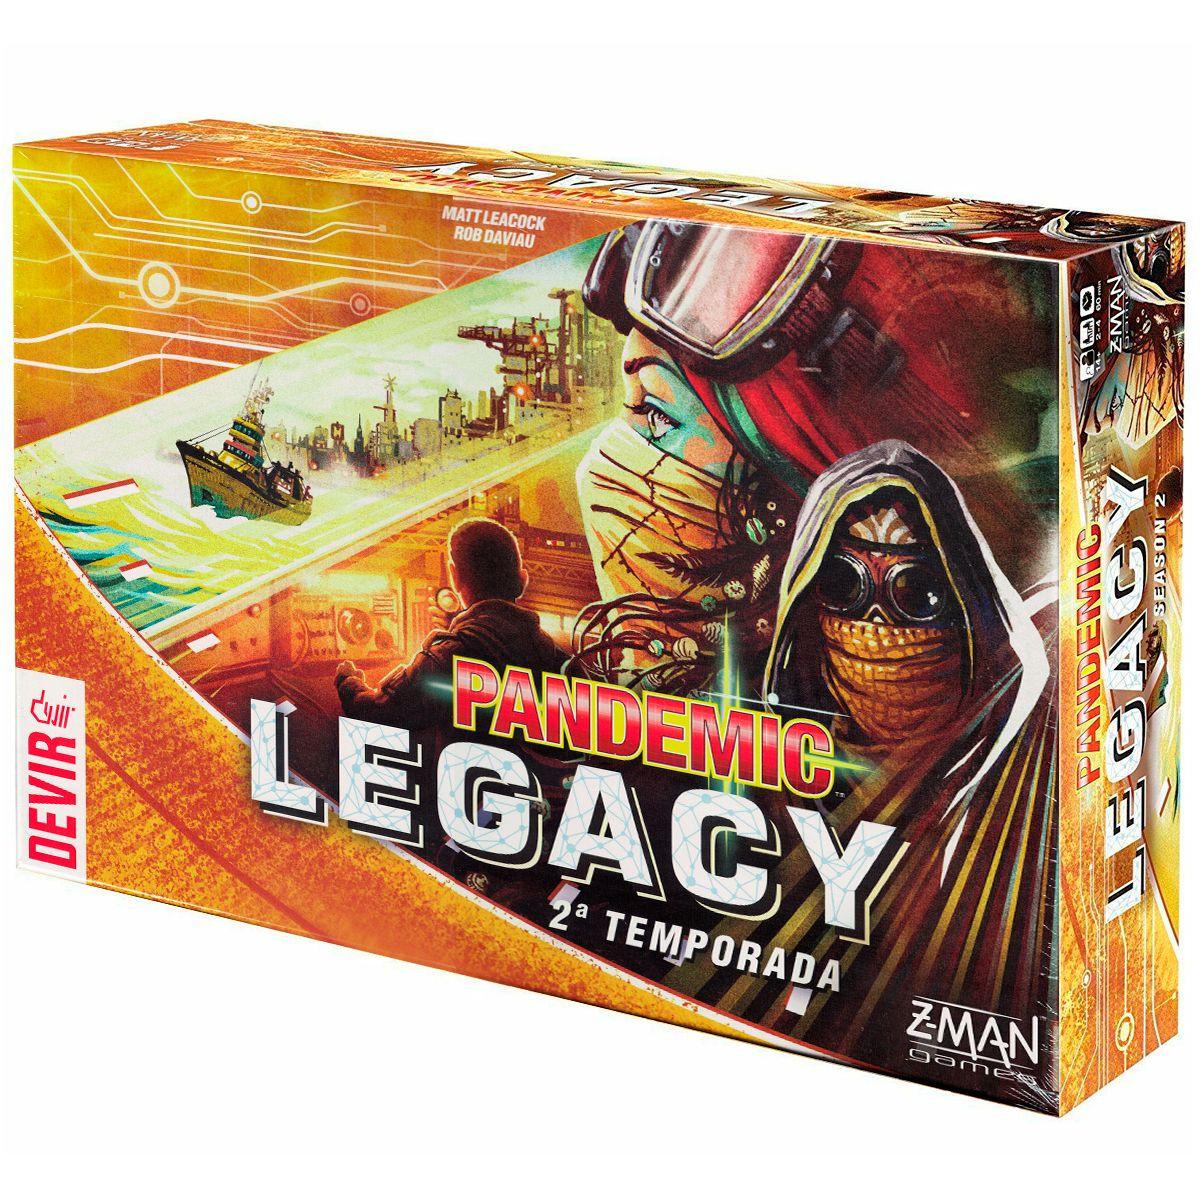 Pandemic Legacy 2ª Temporada Yellow Devir Jogo de Tabuleiro